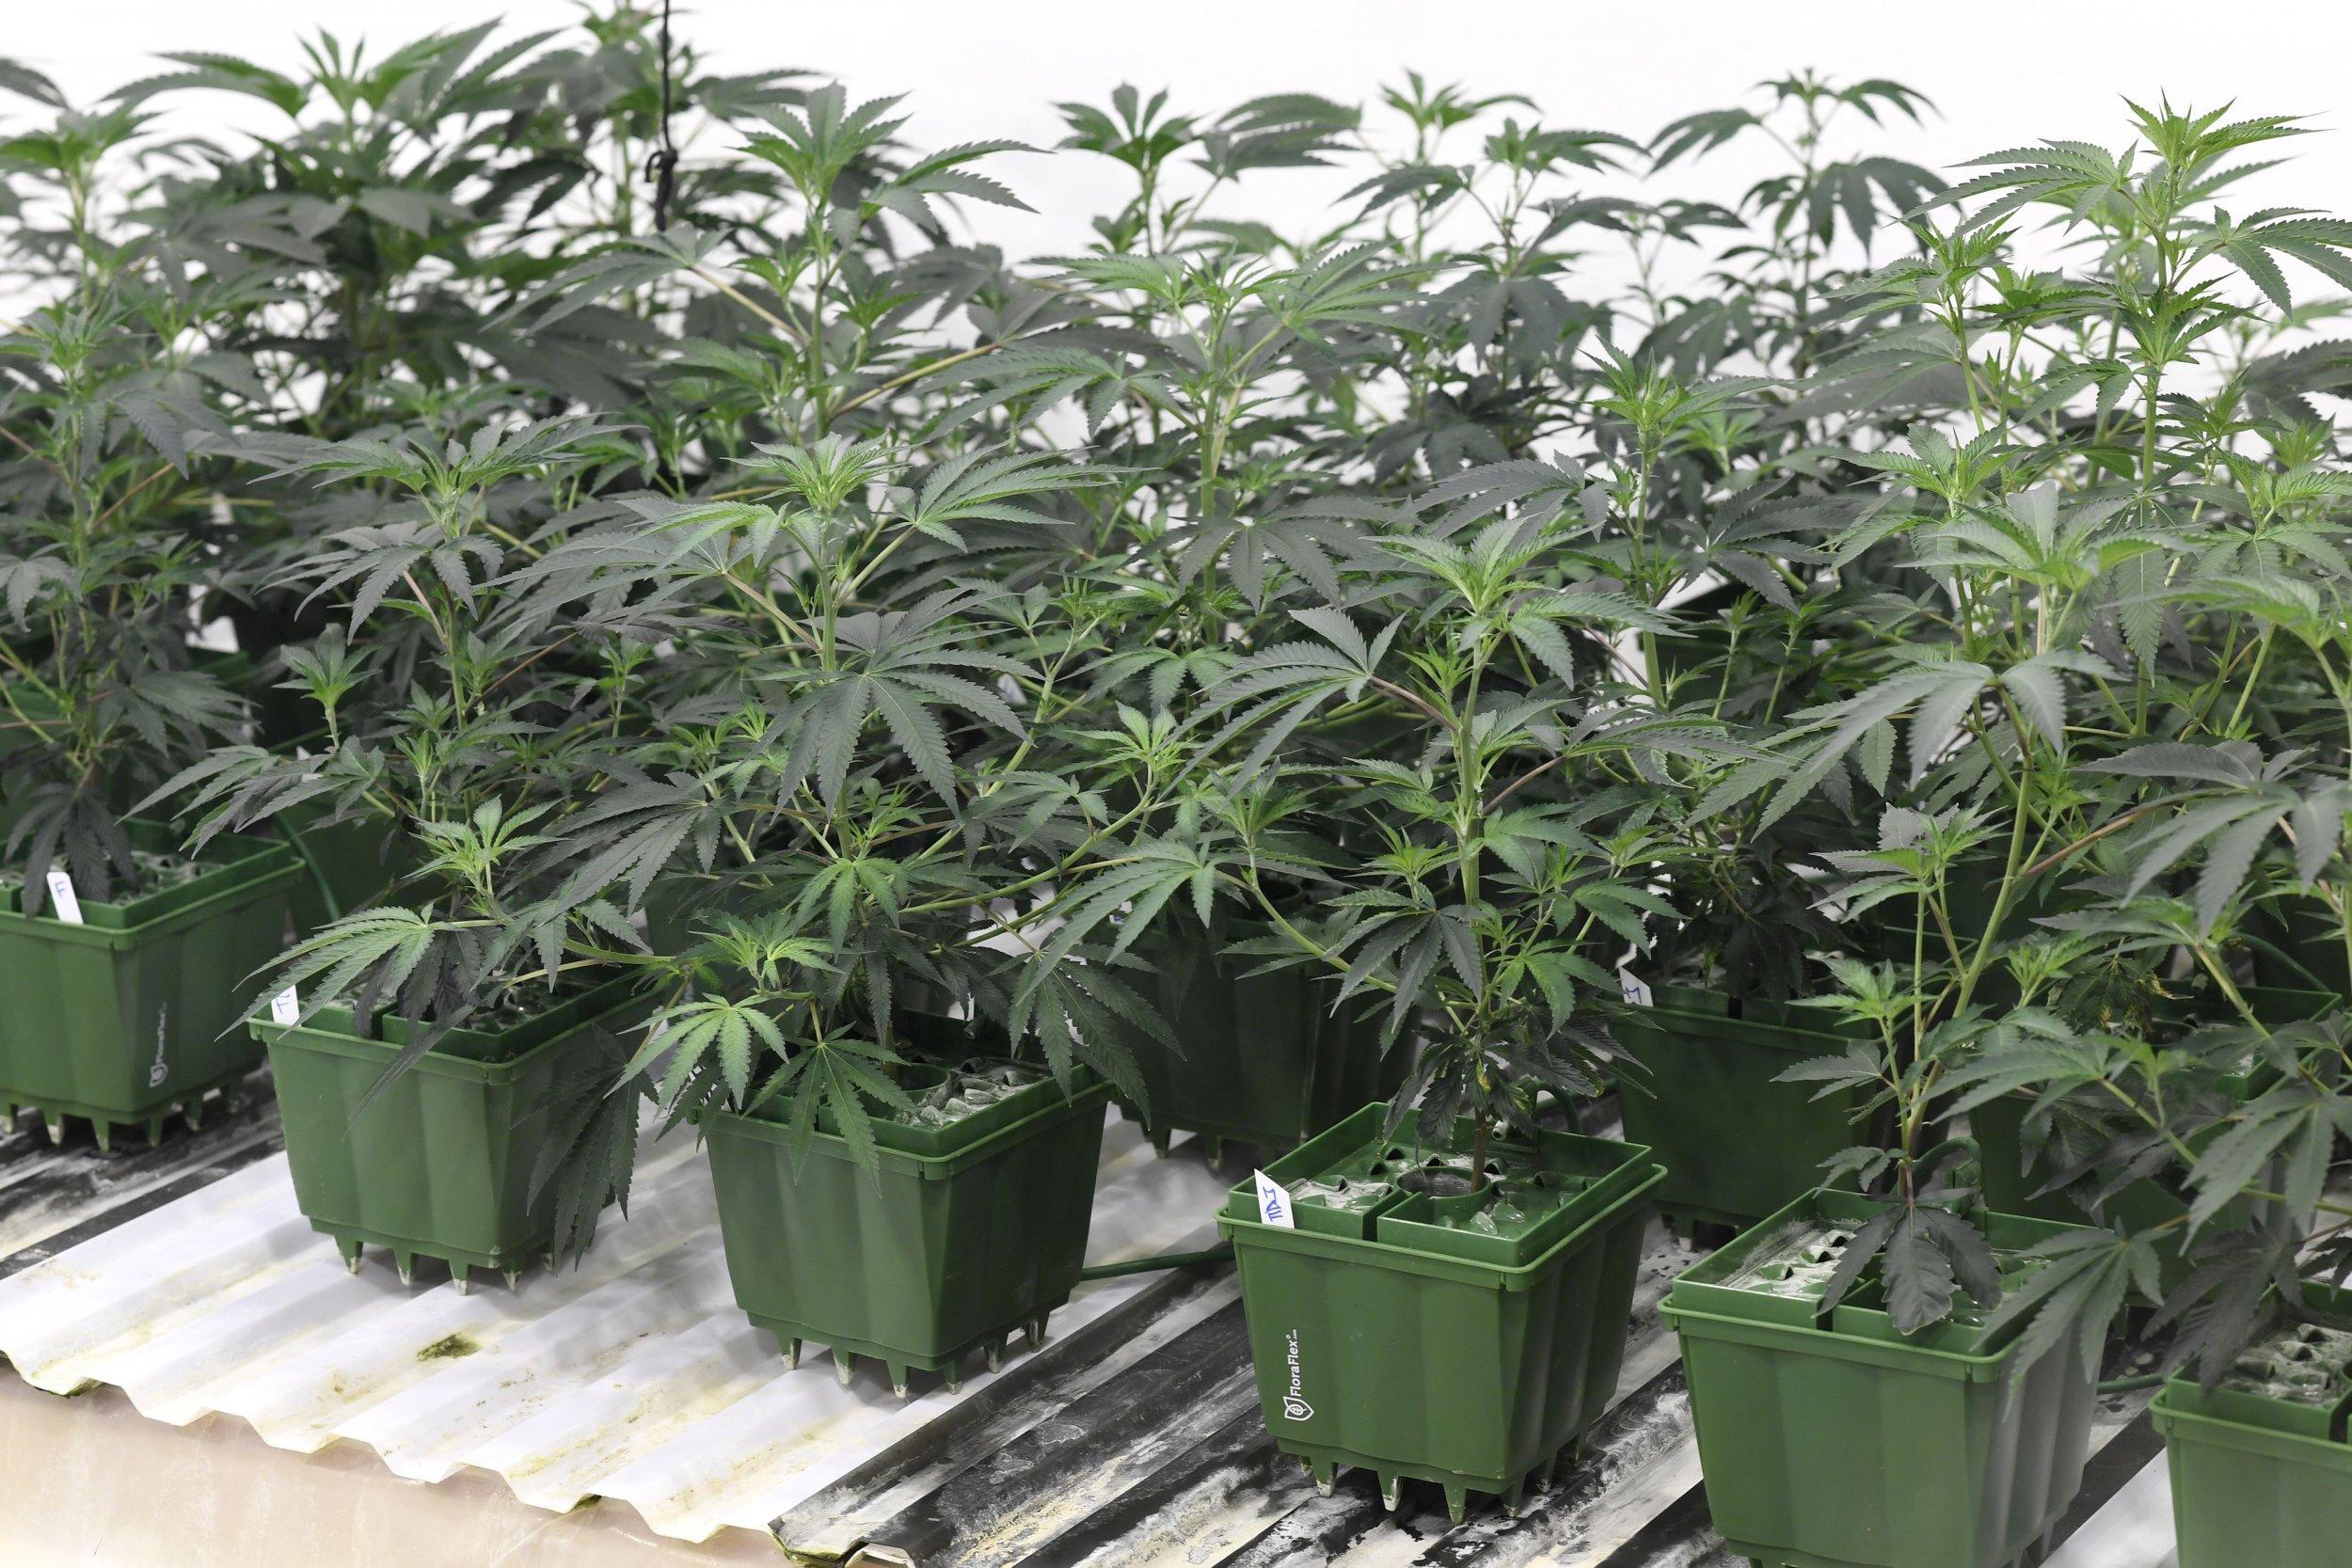 01_16_Marijuana_Plants